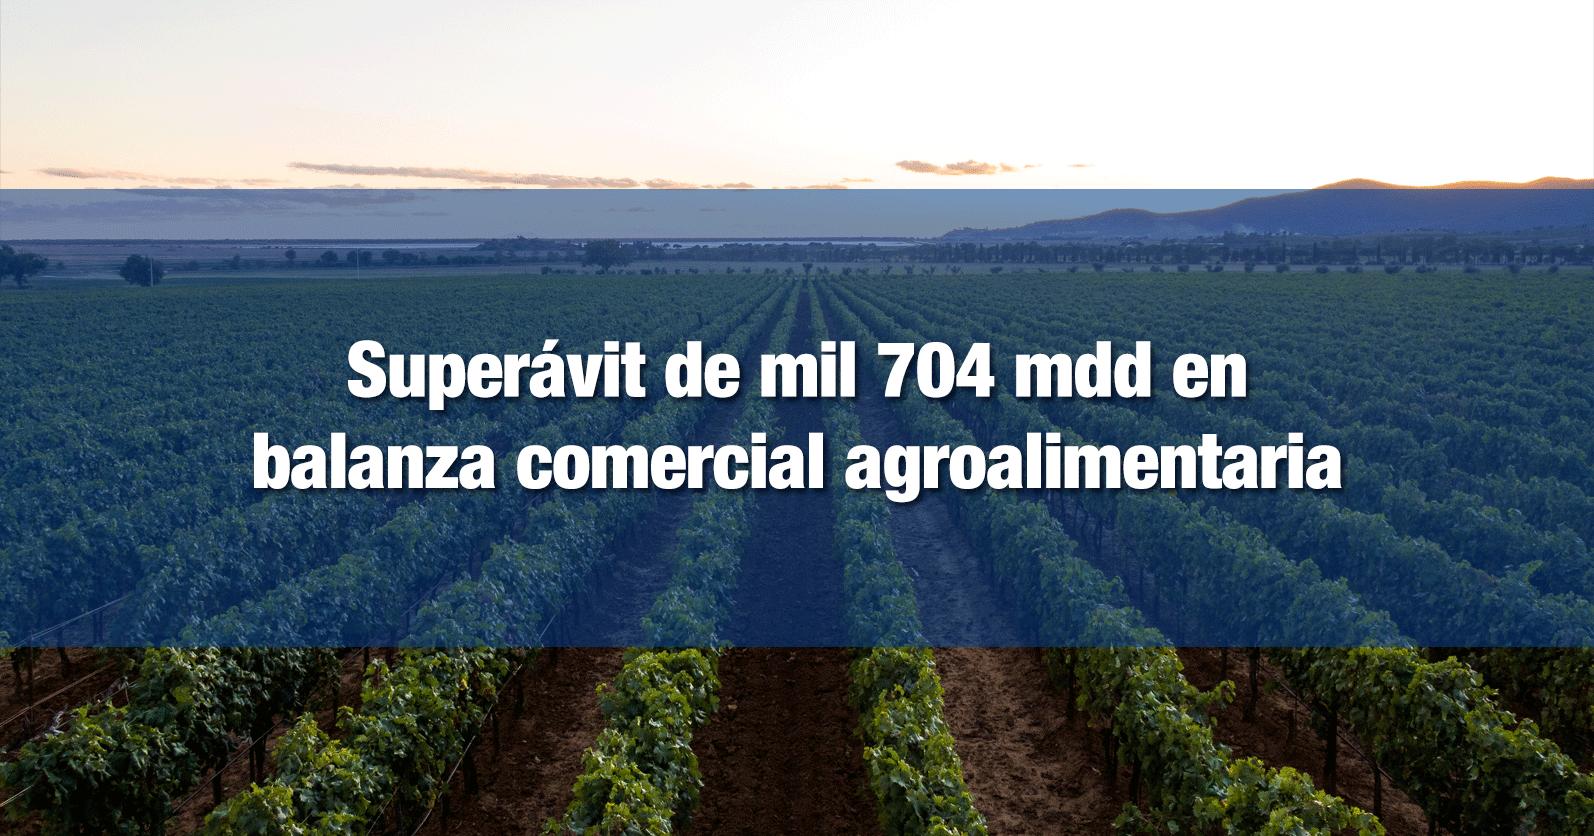 Superávit de mil 704 mdd en balanza comercial agroalimentaria